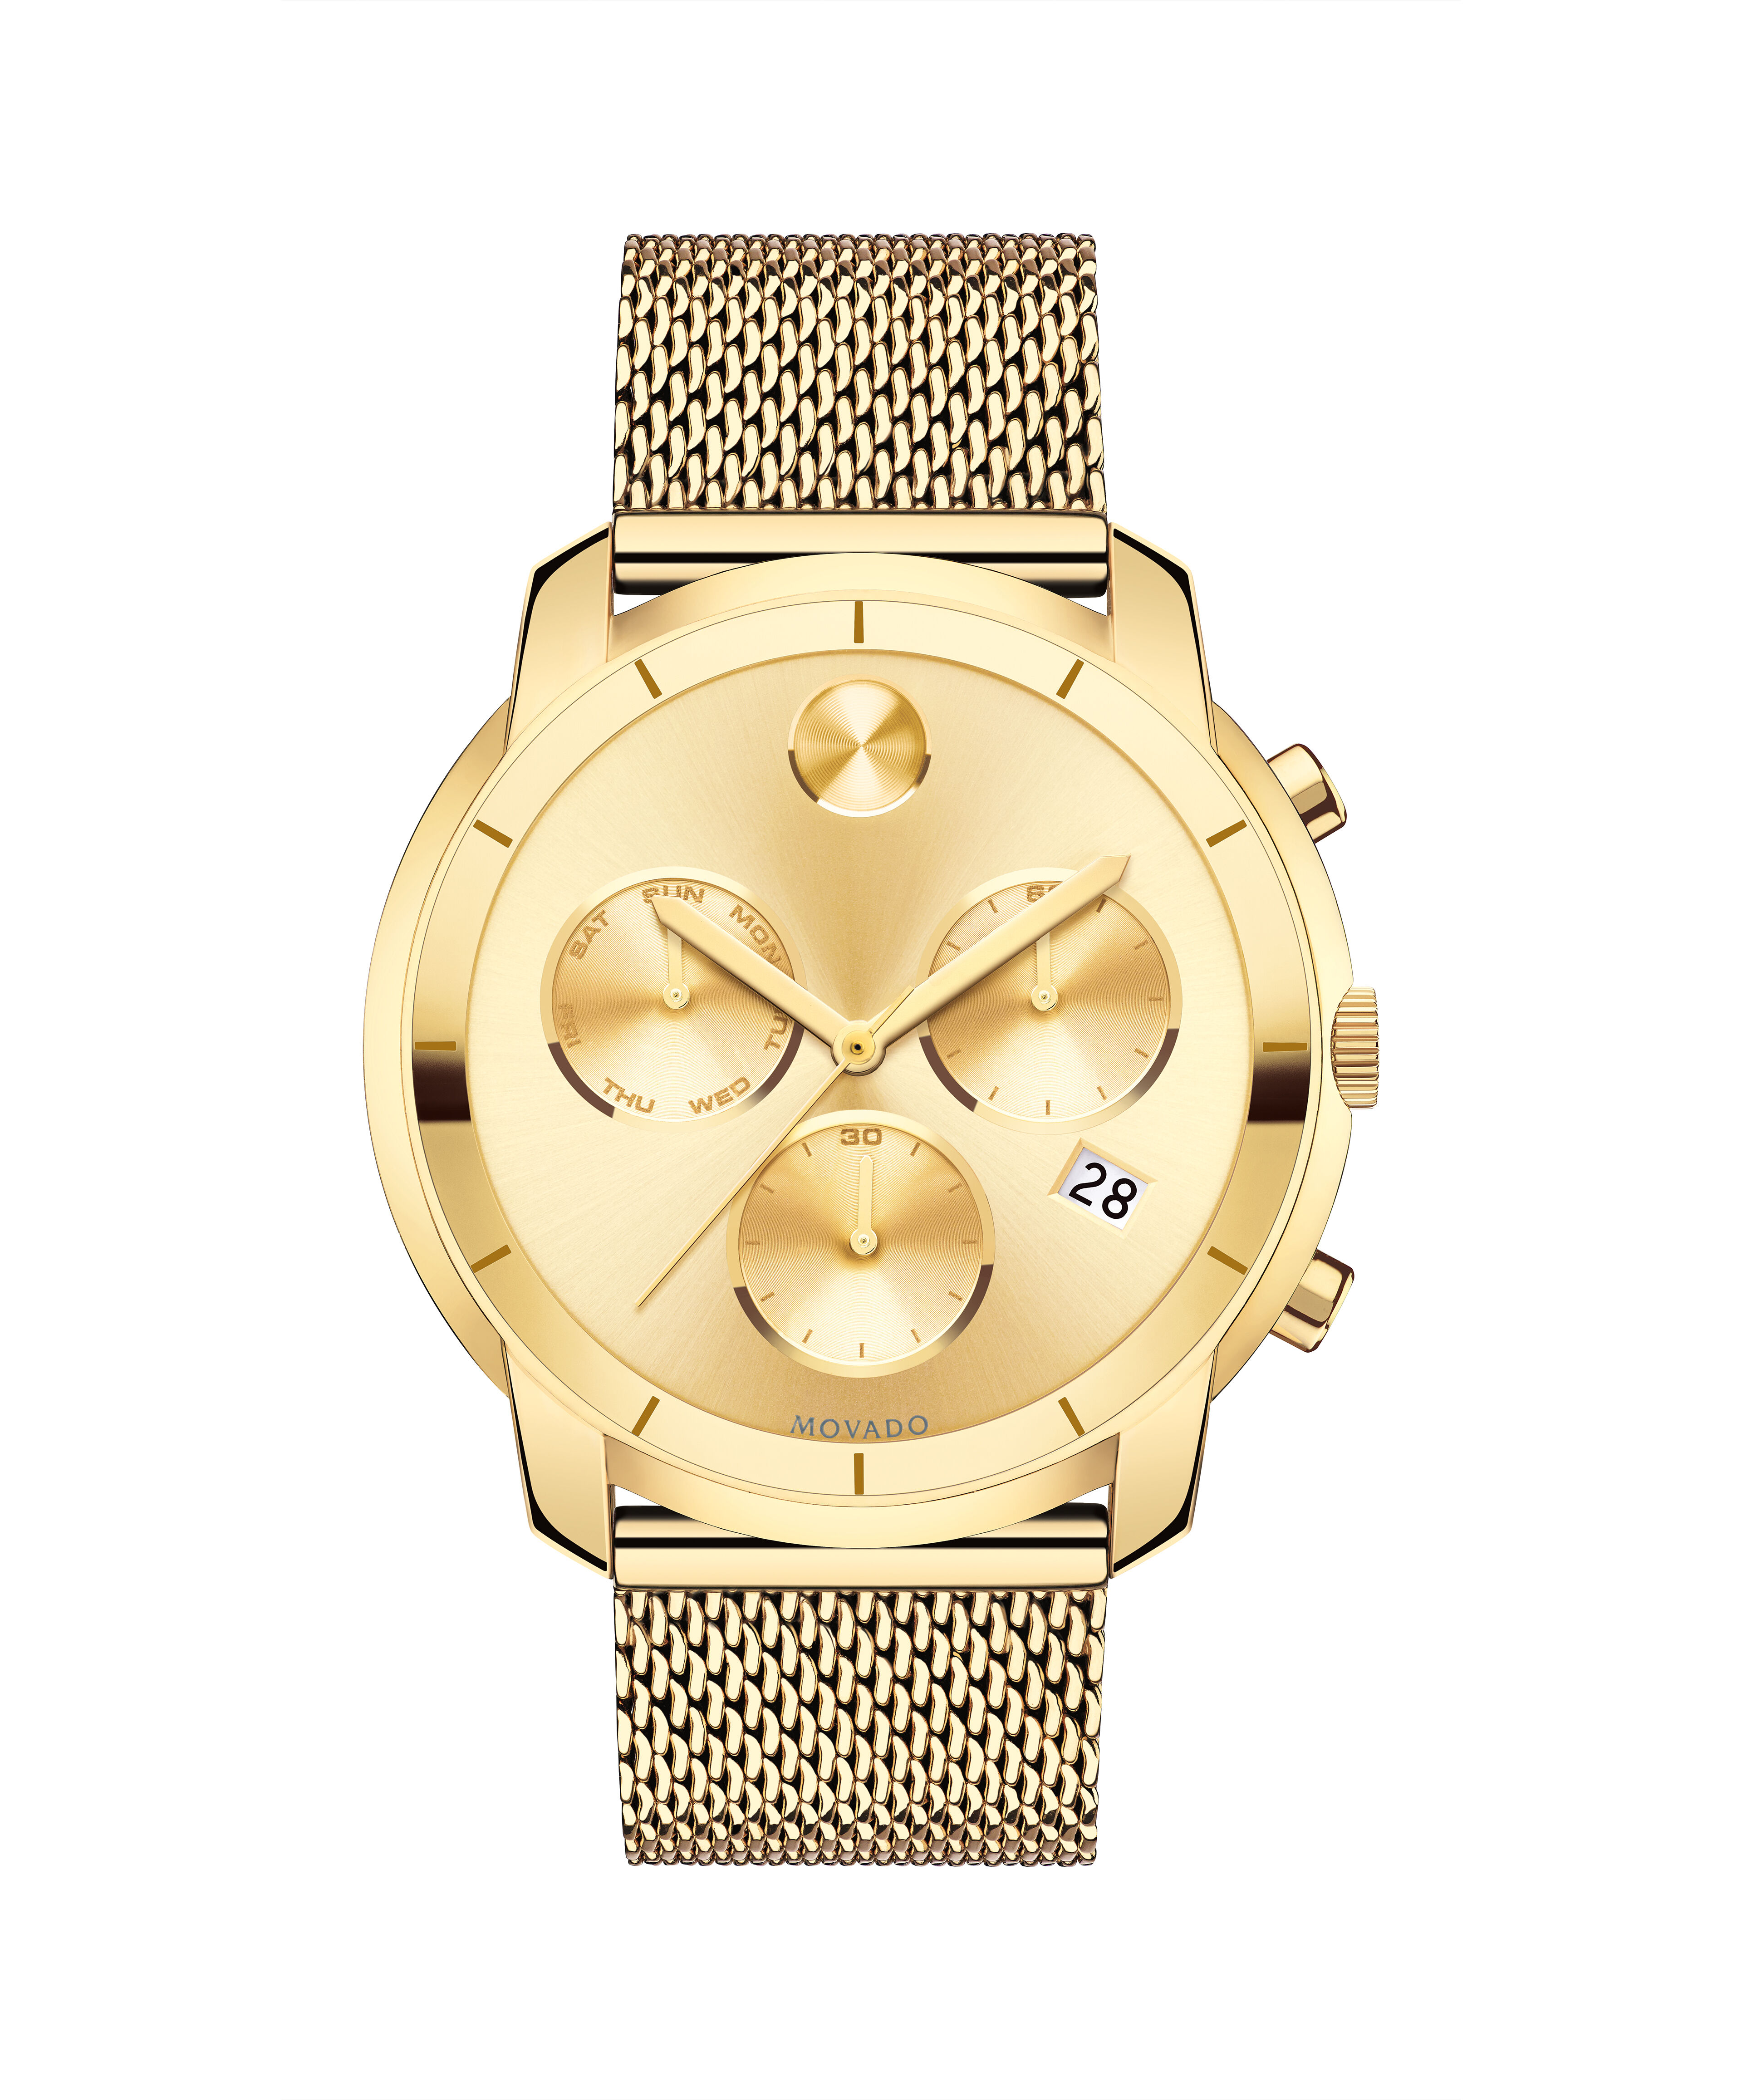 Luxury Replica Breitling Watches